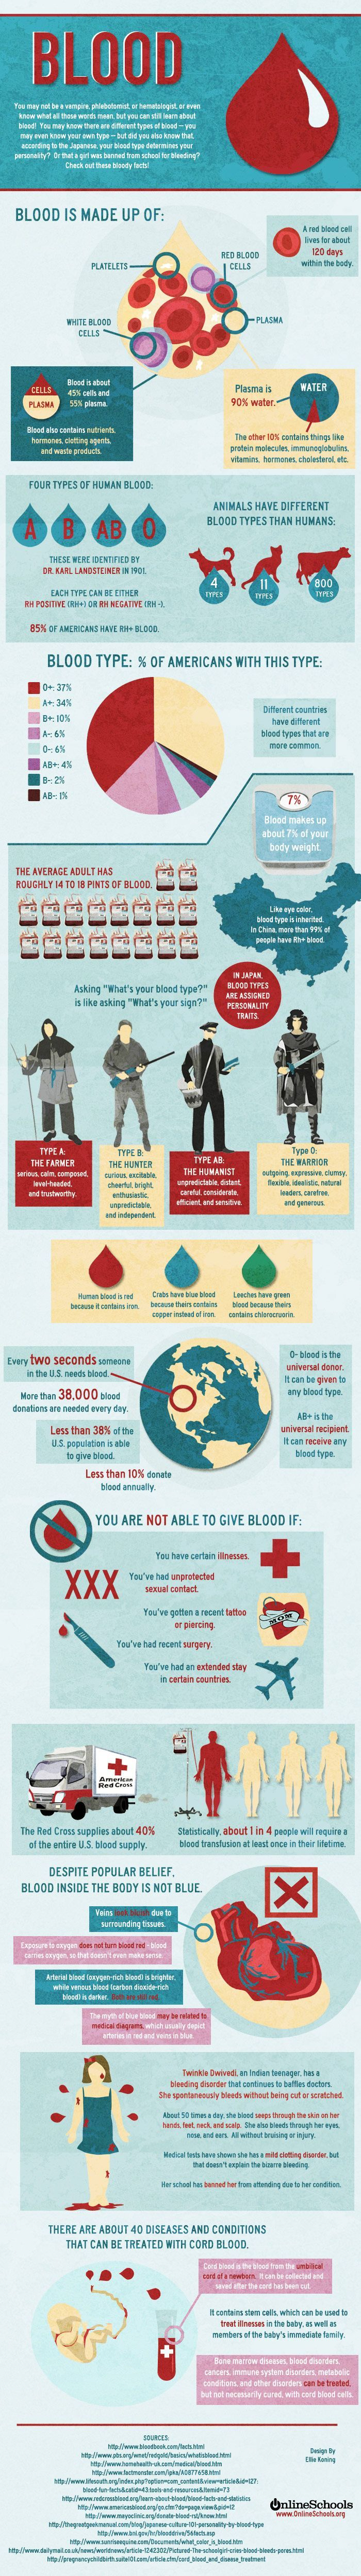 87 best Blood images on Pinterest   Blood, Nurses and Autoimmune disease